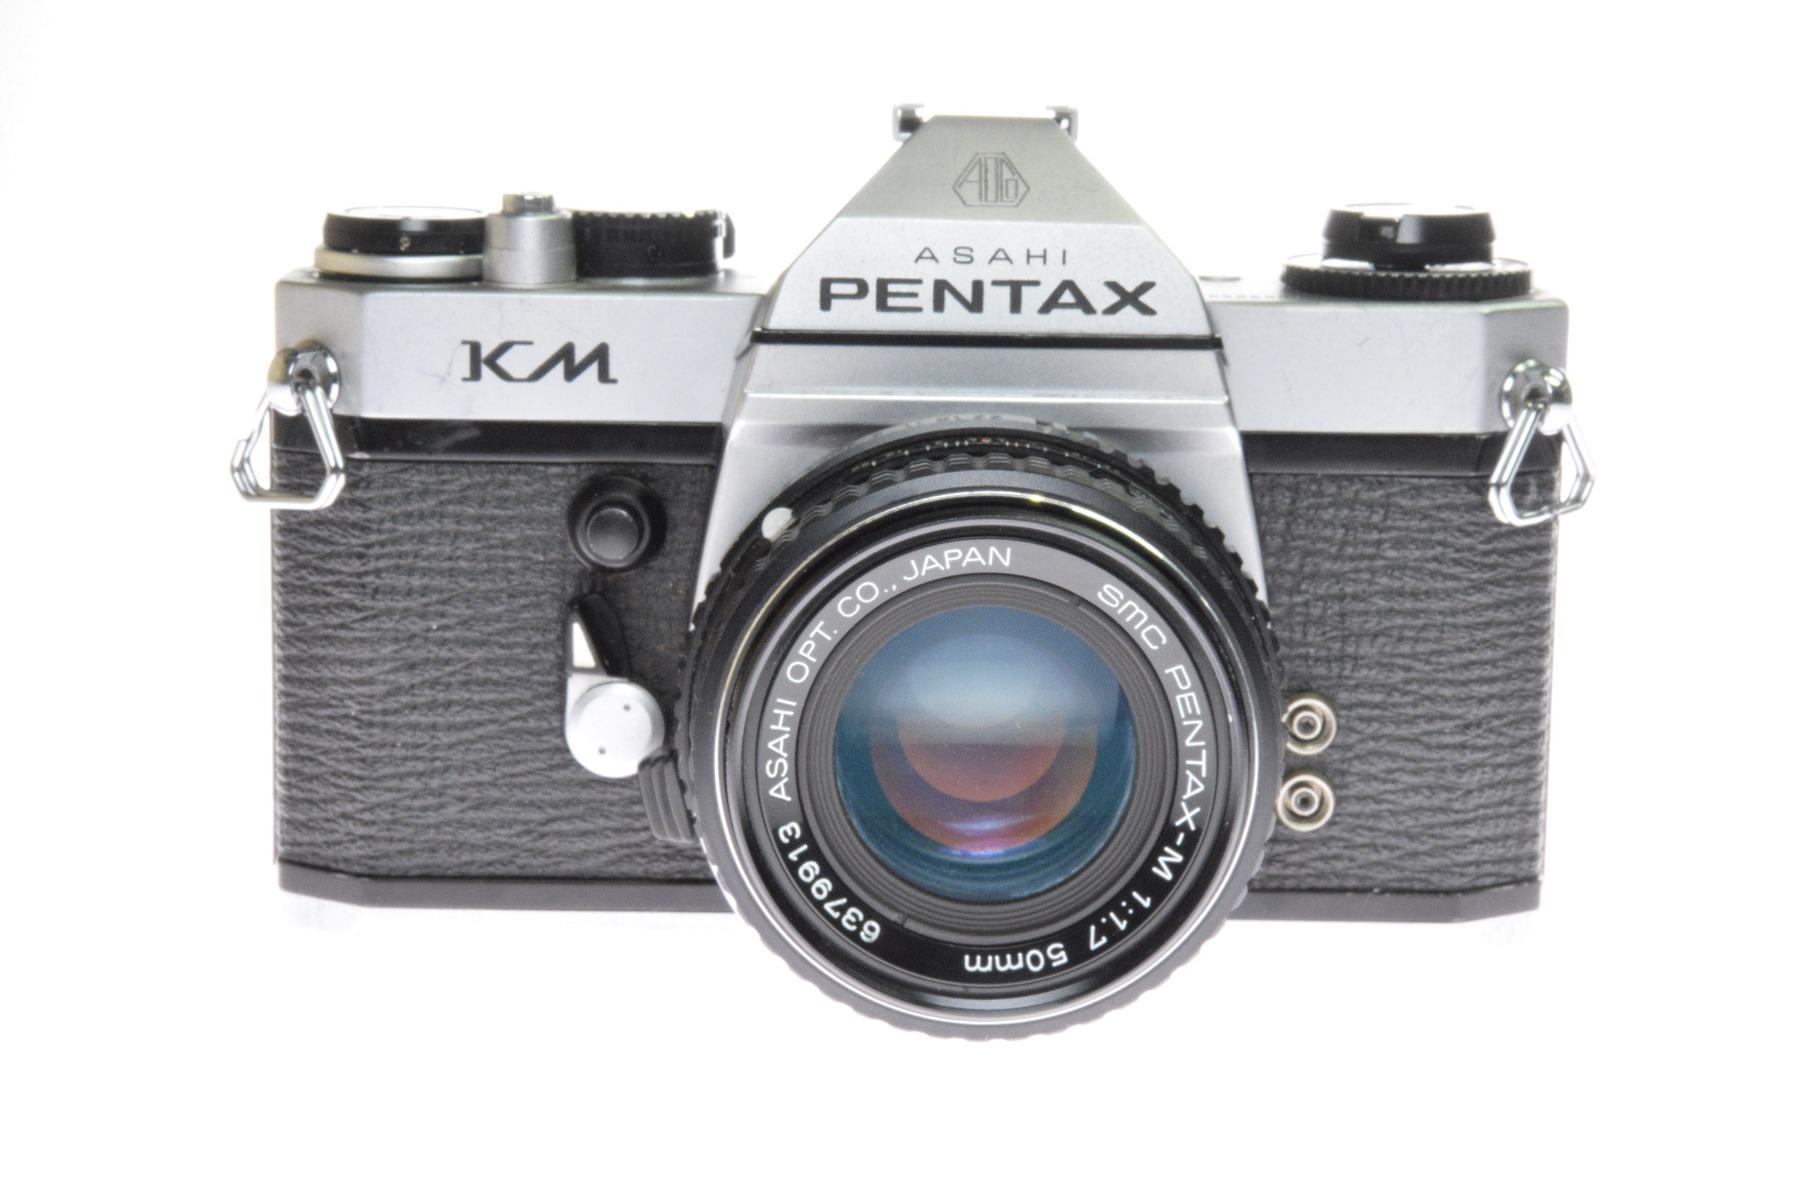 Used Pentax KM 35mm SLR Camera & 50mm f1.7 Lens